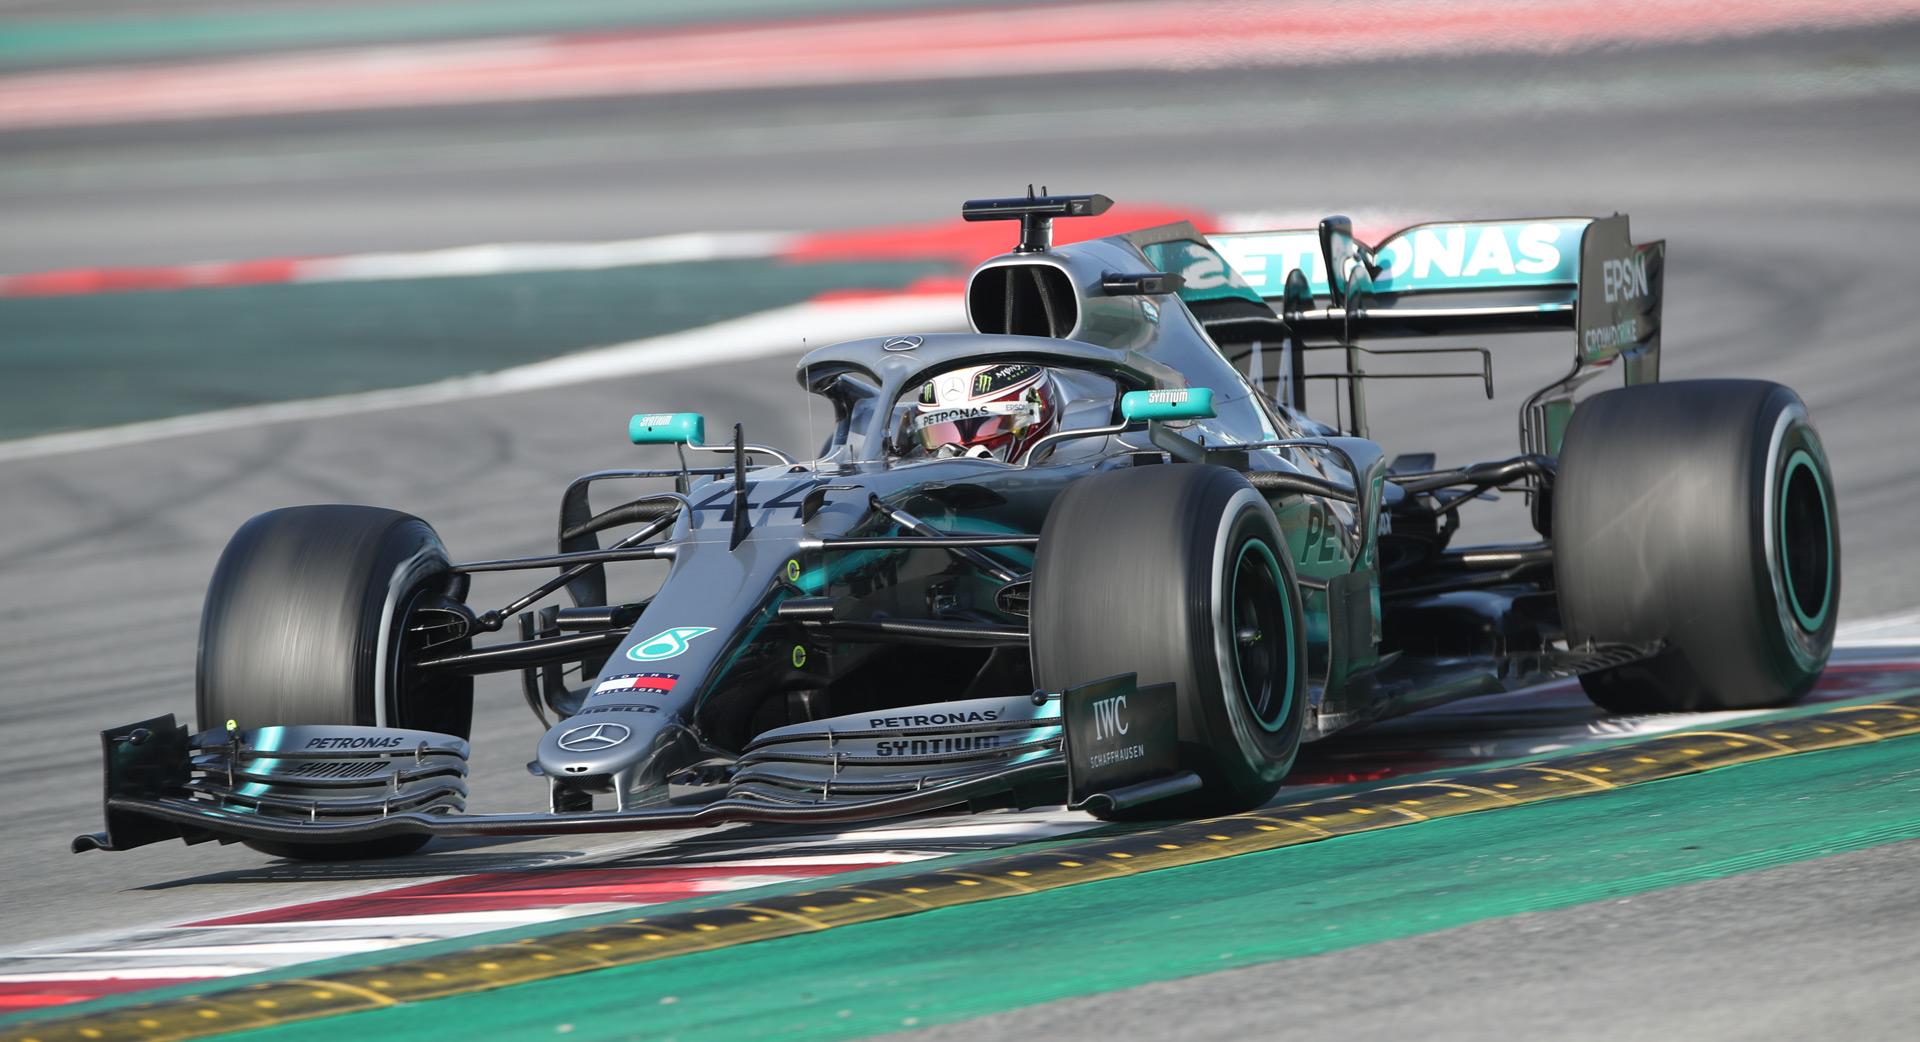 Penske reportedly in talks to buy Mercedes-AMG Formula 1 team